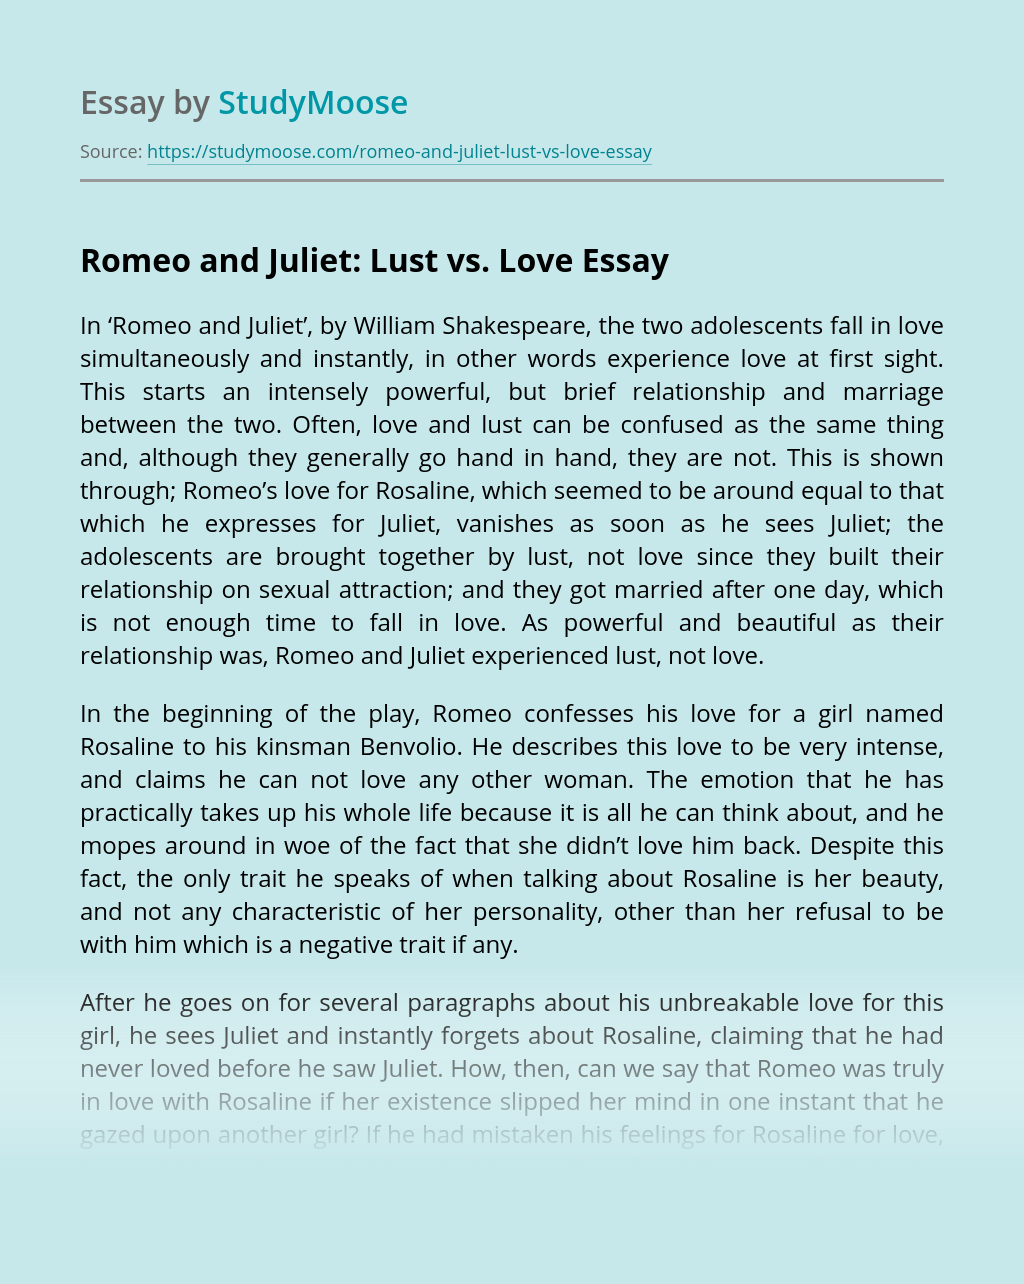 Romeo and Juliet: Lust vs. Love